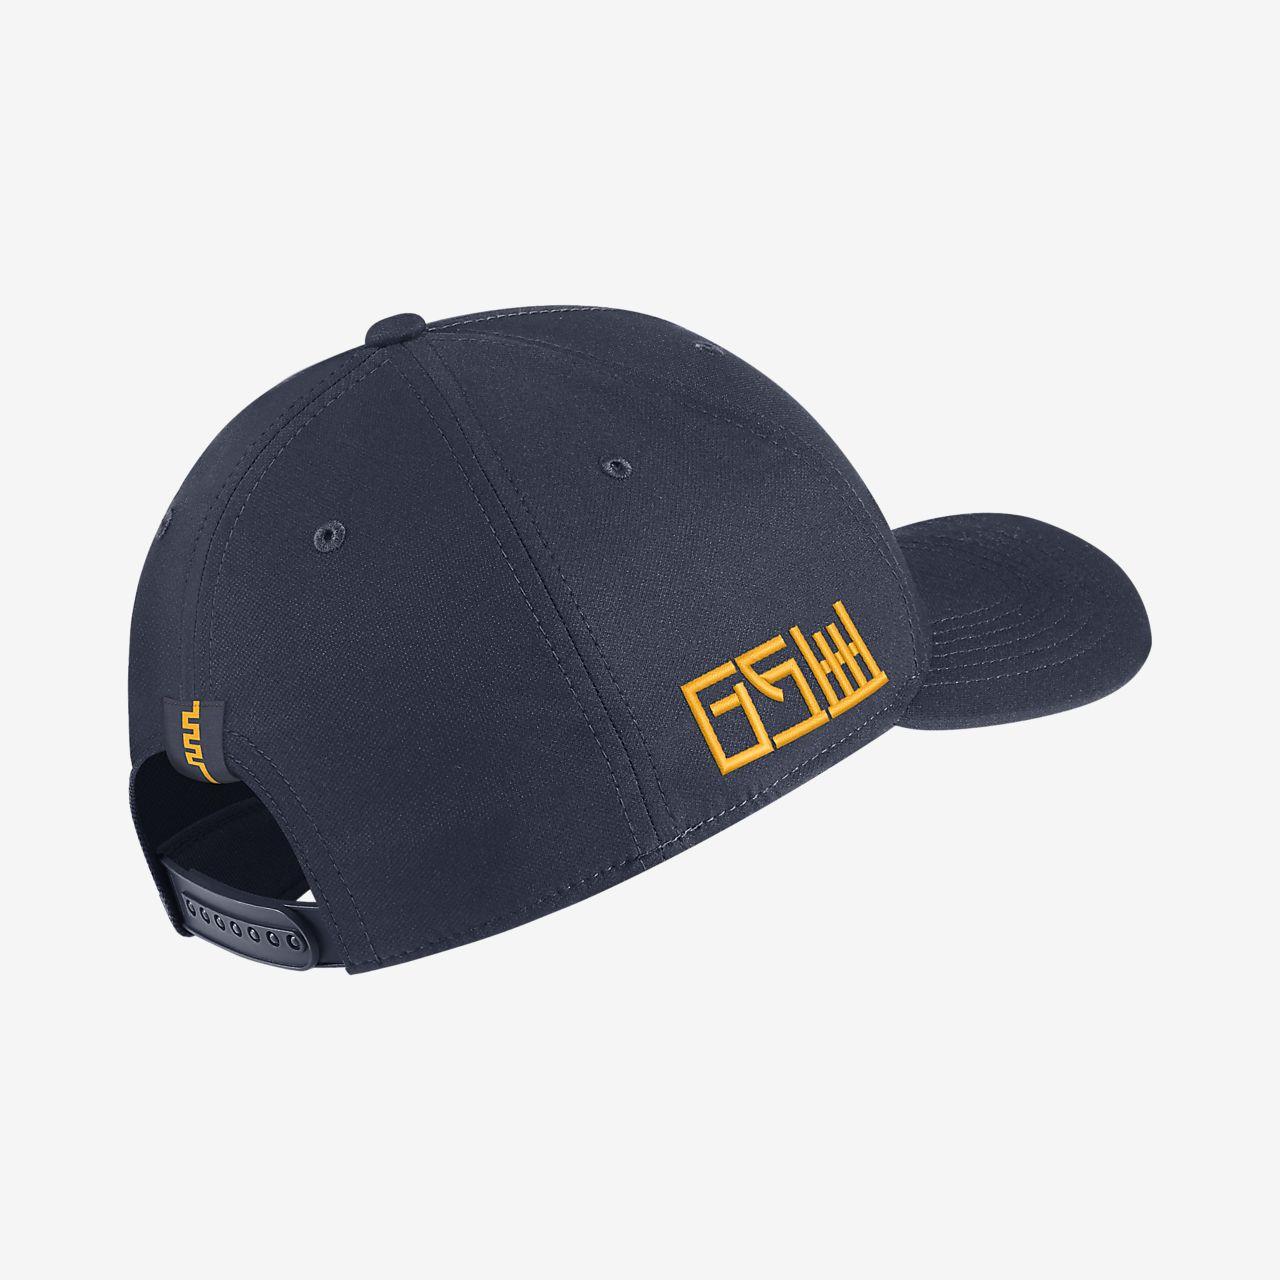 e8bf7bda2fc30 Golden State Warriors City Edition Nike AeroBill Classic99 NBA Hat ...